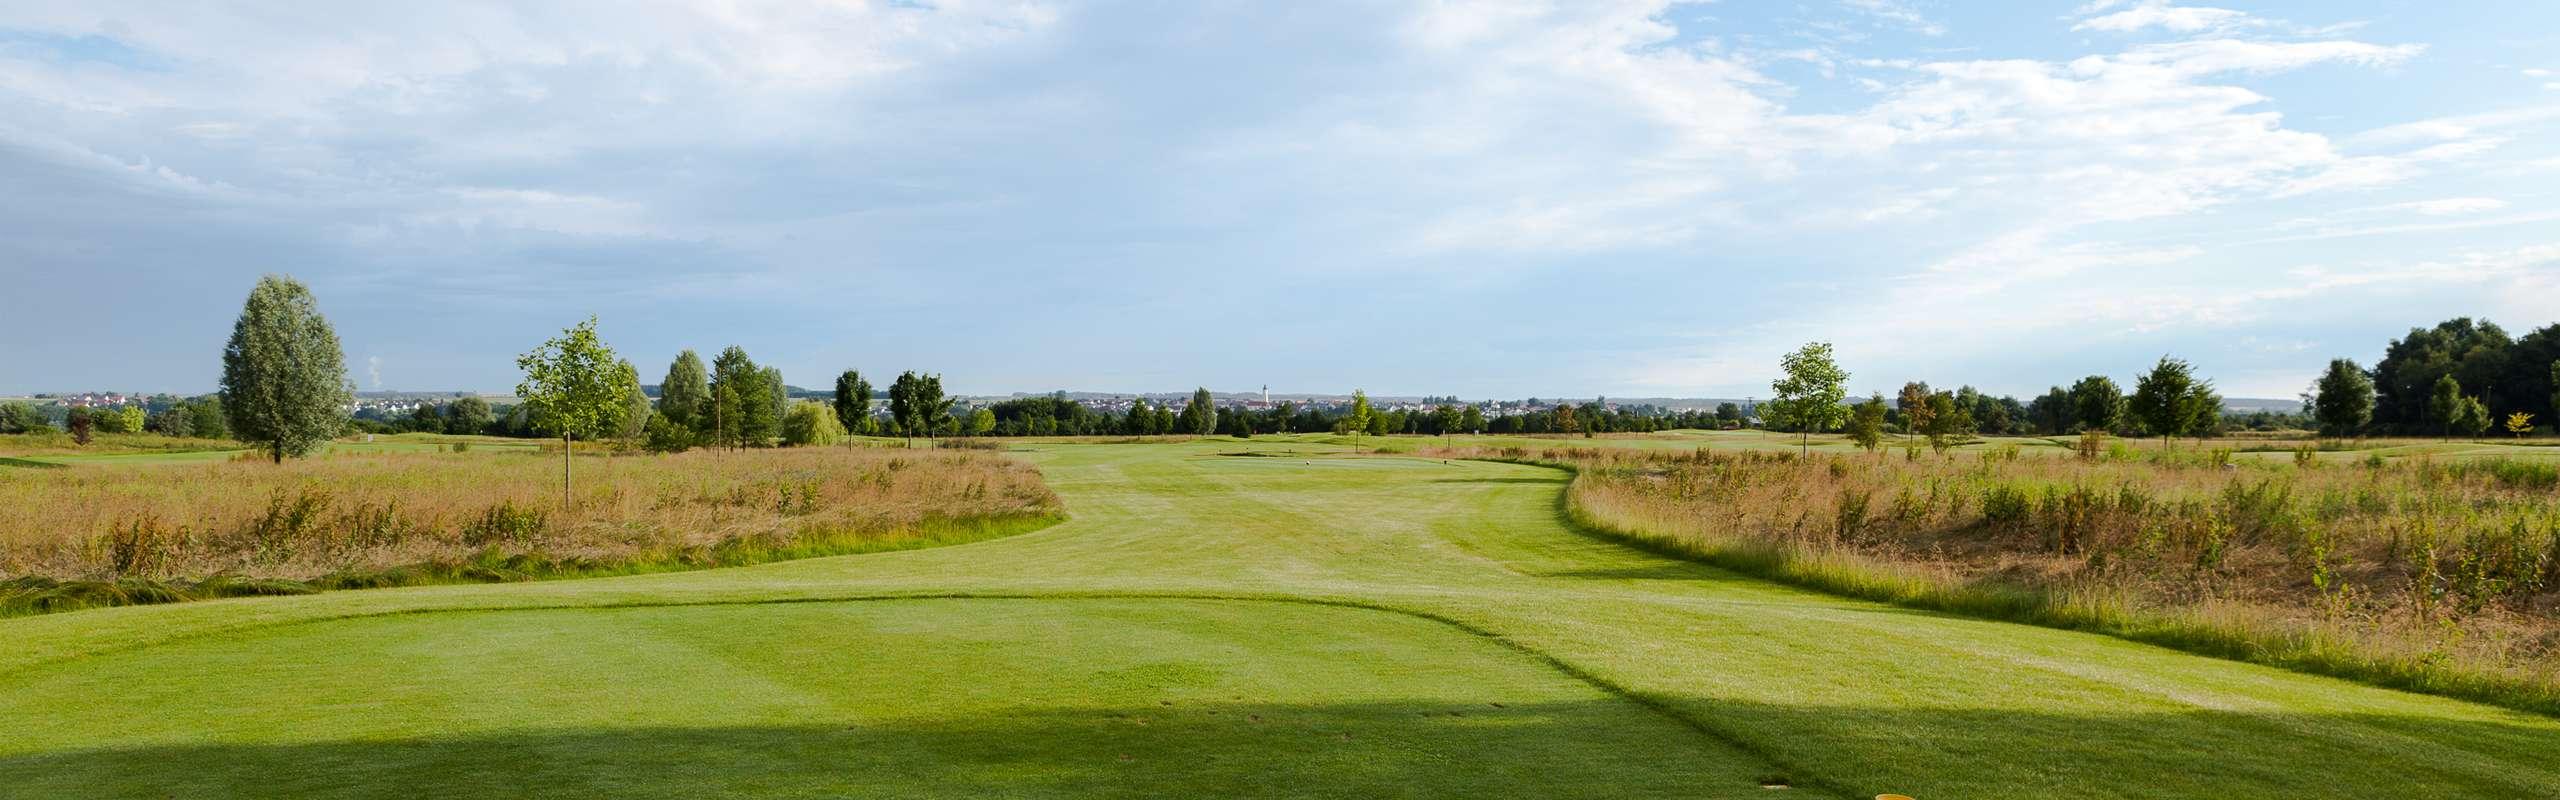 Golfclub-Donau-Riss-Aktuell-Slide3